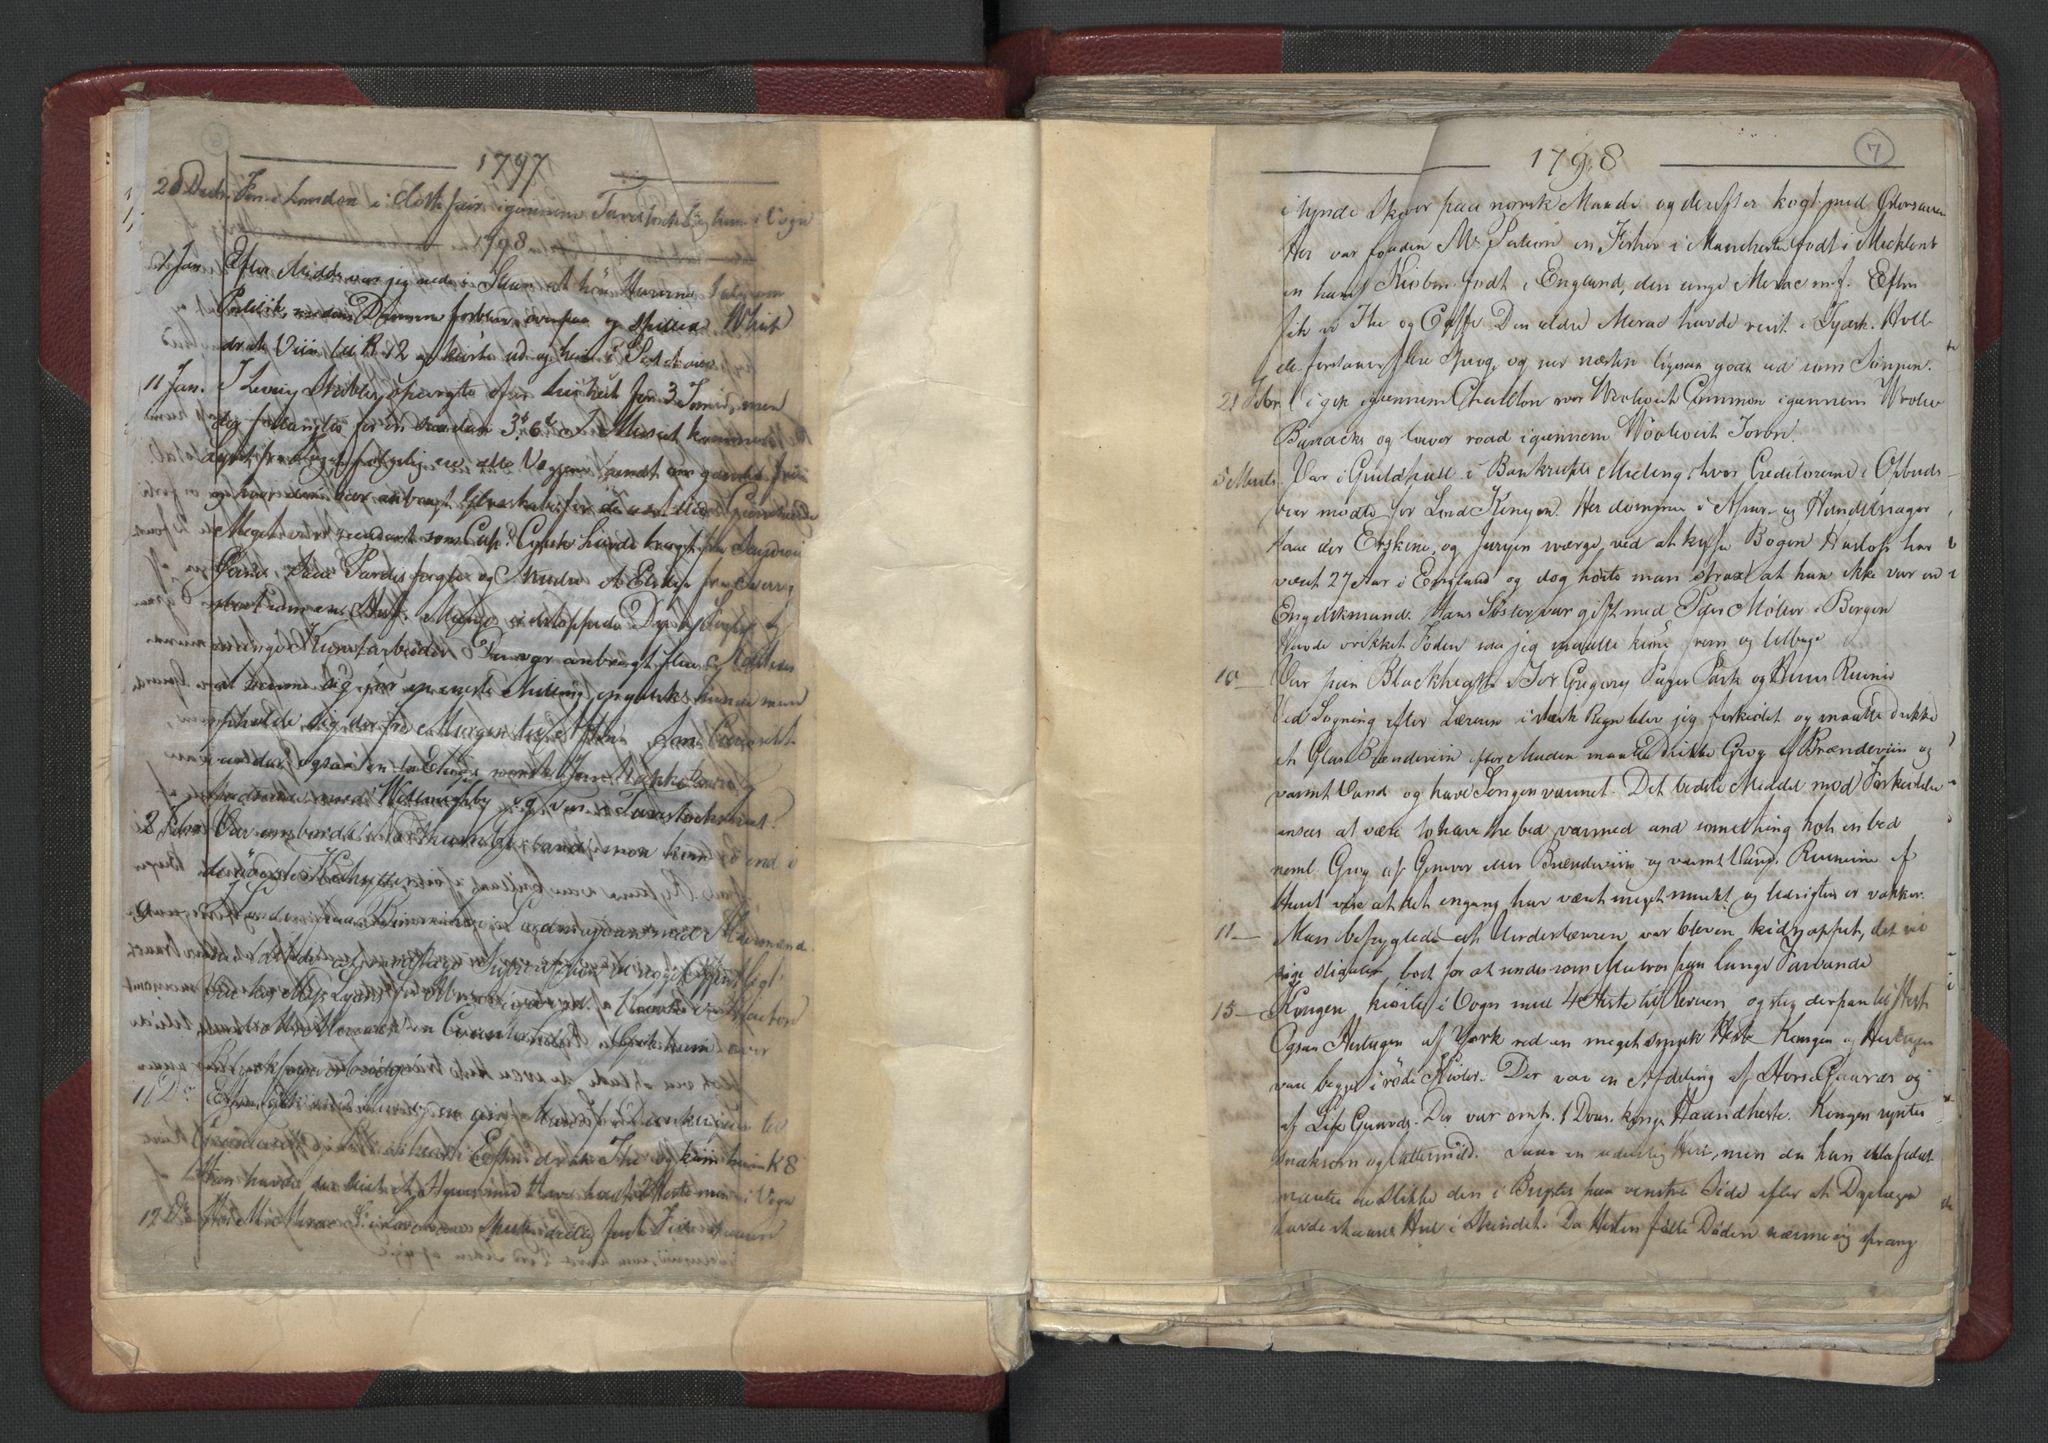 RA, Meltzer, Fredrik, F/L0001: Dagbok for årene 1796-1808, 1811, 1817, 1796-1817, s. 6b-7a